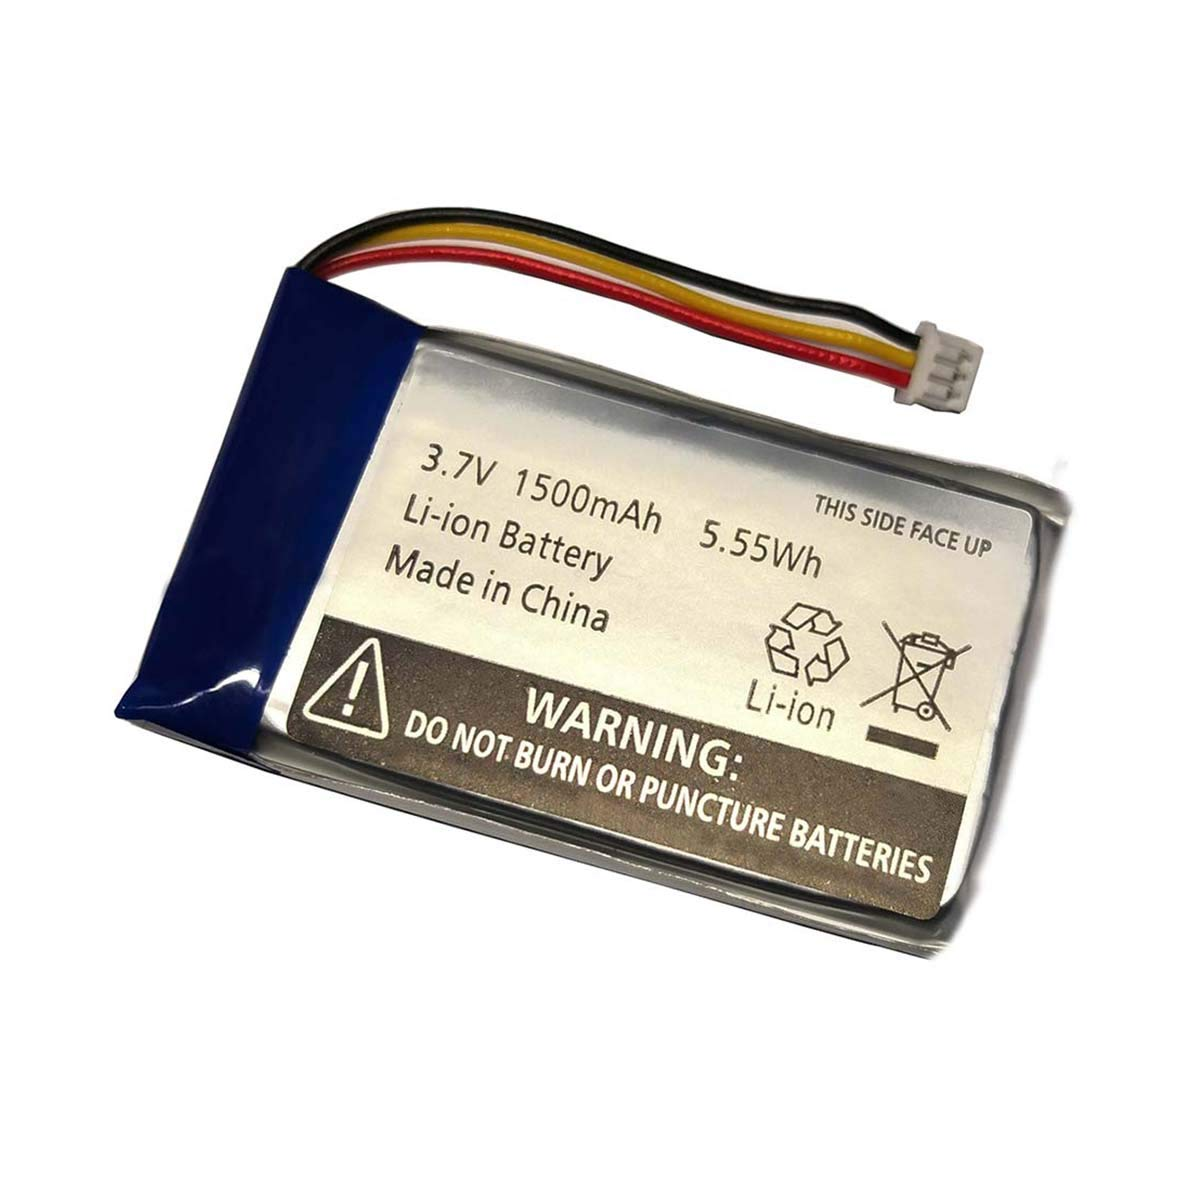 1500mAh Replacement Li-ion Battery for Infant Optics DXR-8 Video Baby Monitors